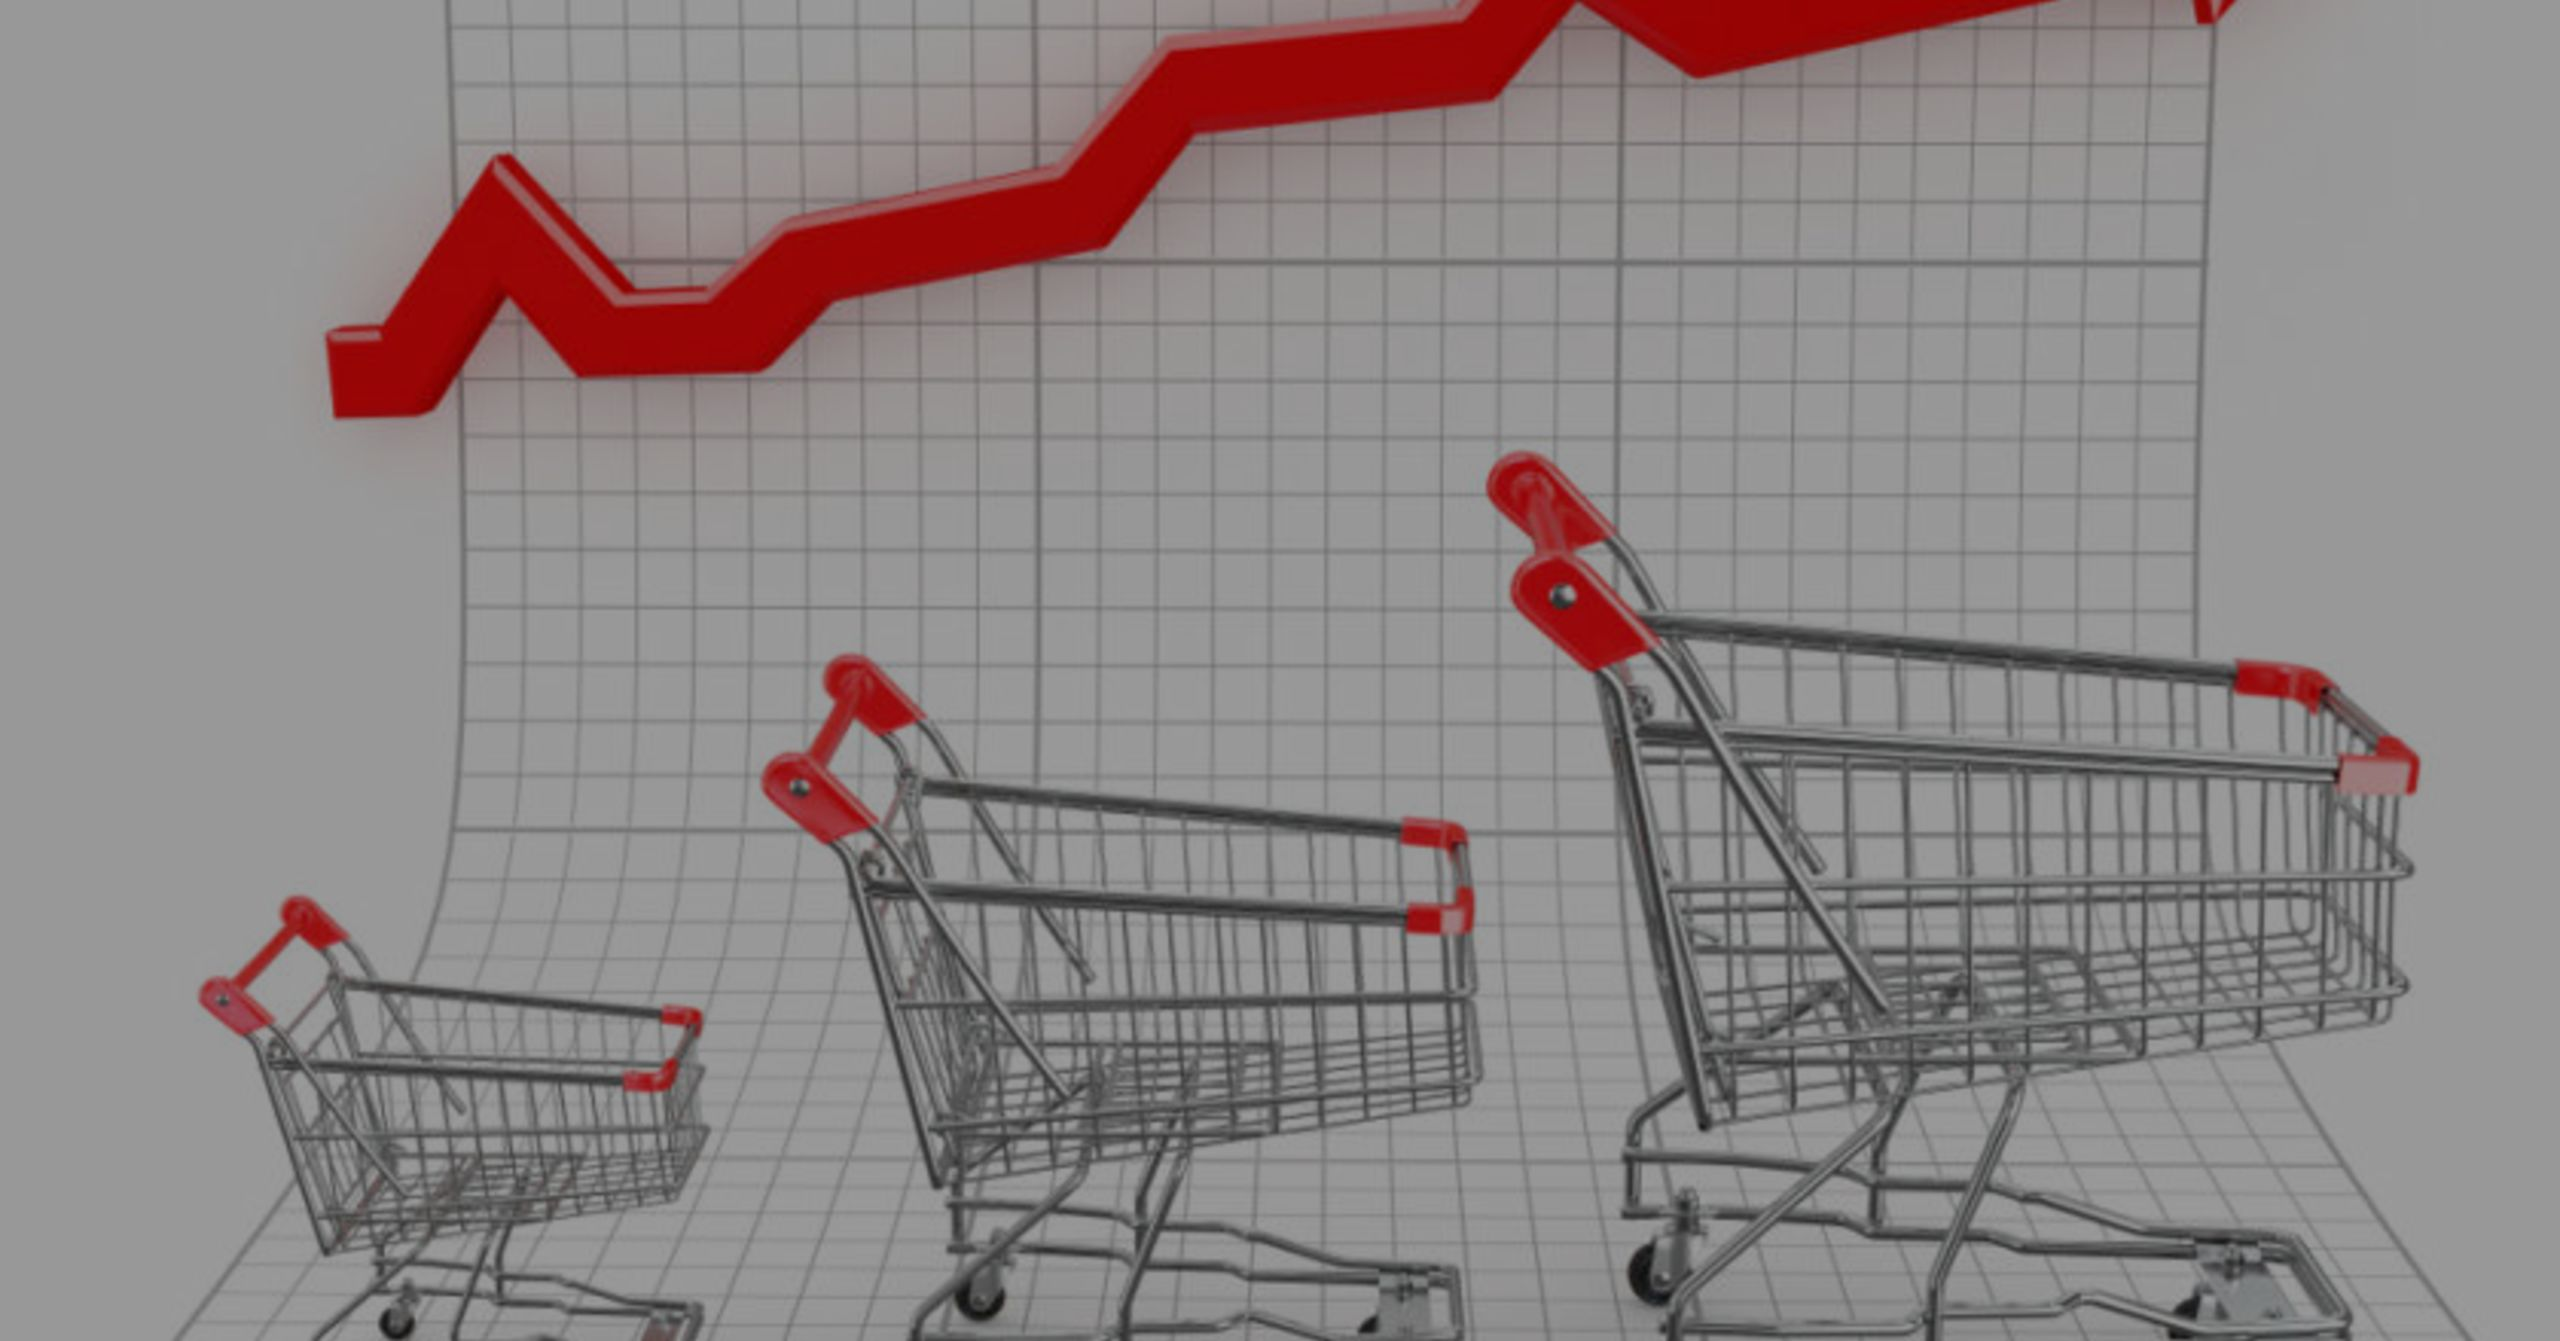 Florida consumer confidence broke records in 2017